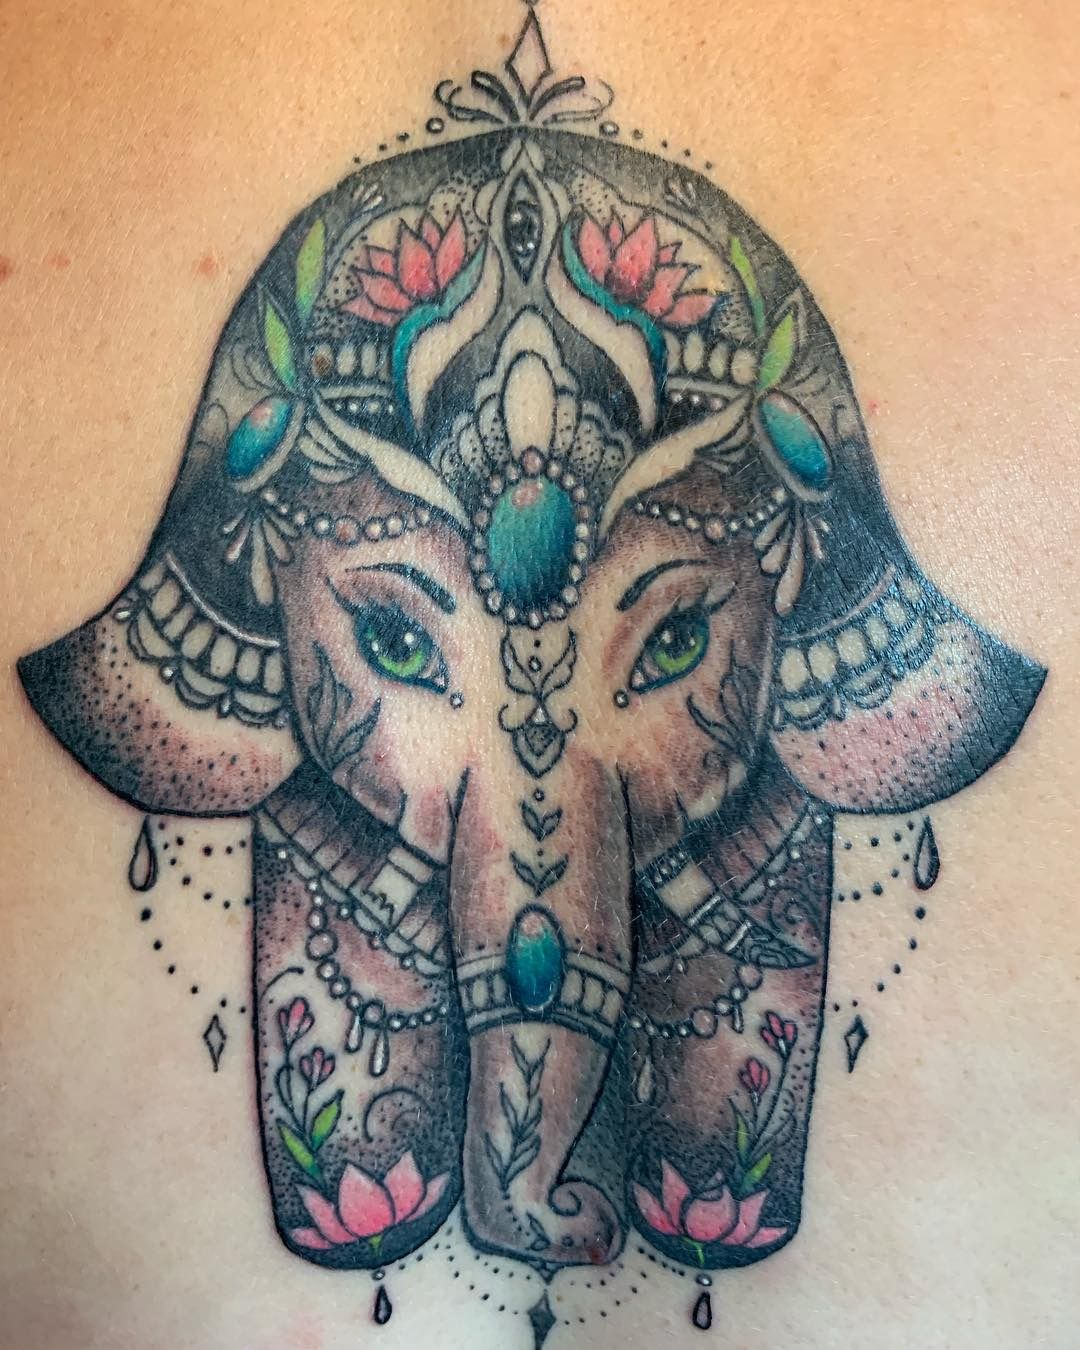 Cute Ganesha in Hamsa hand shape tattoo